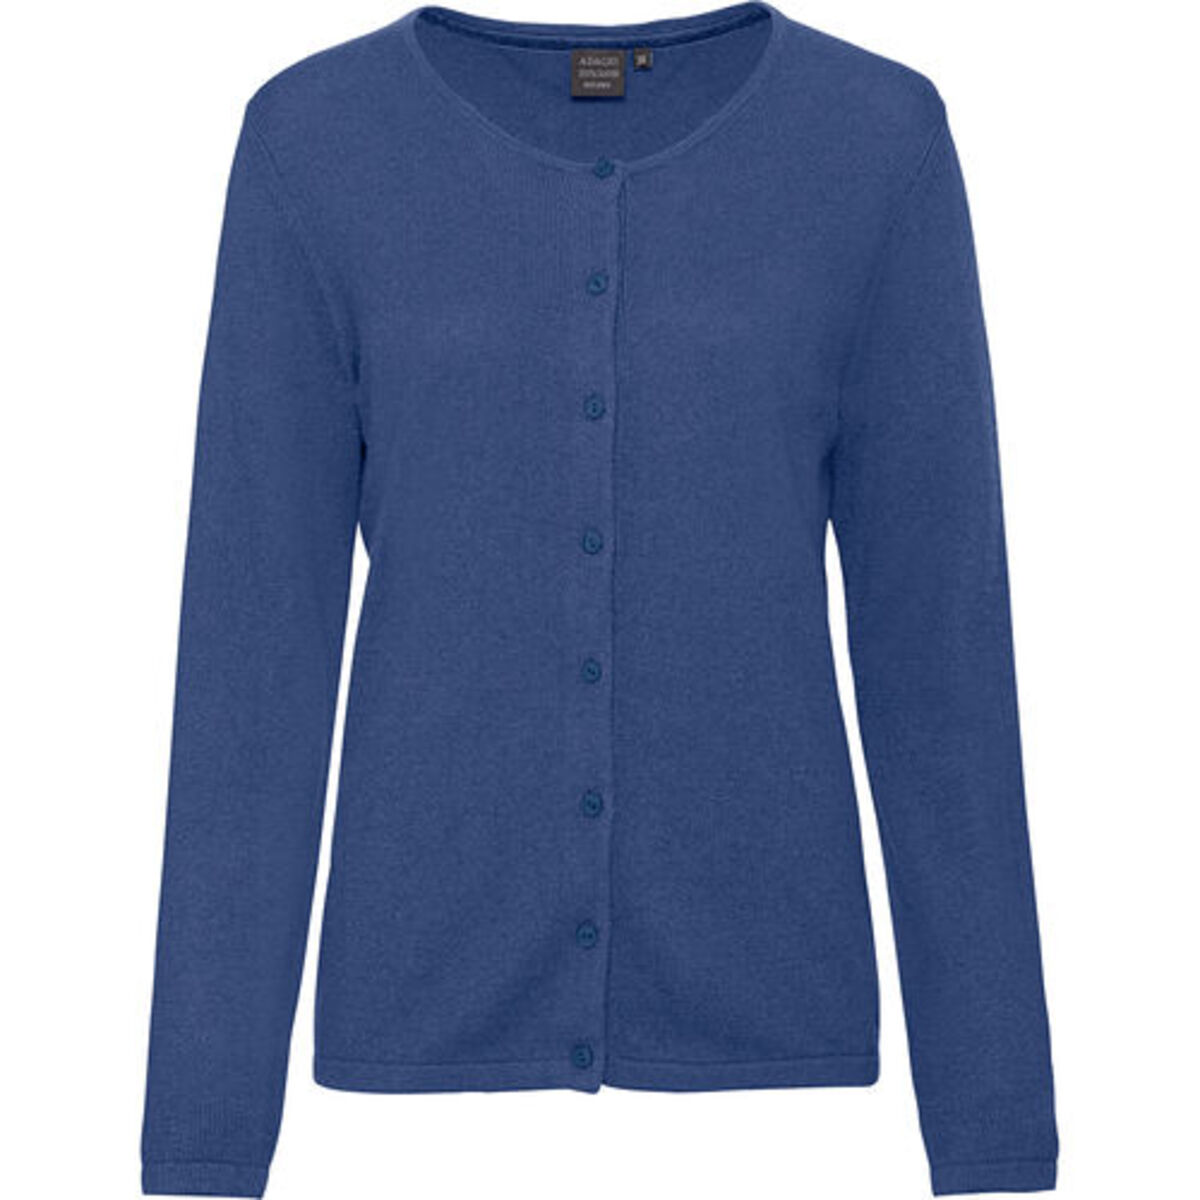 Bild 2 von Adagio Damen Seide-Cashmere Cardigan, jeansblau, 46, 46